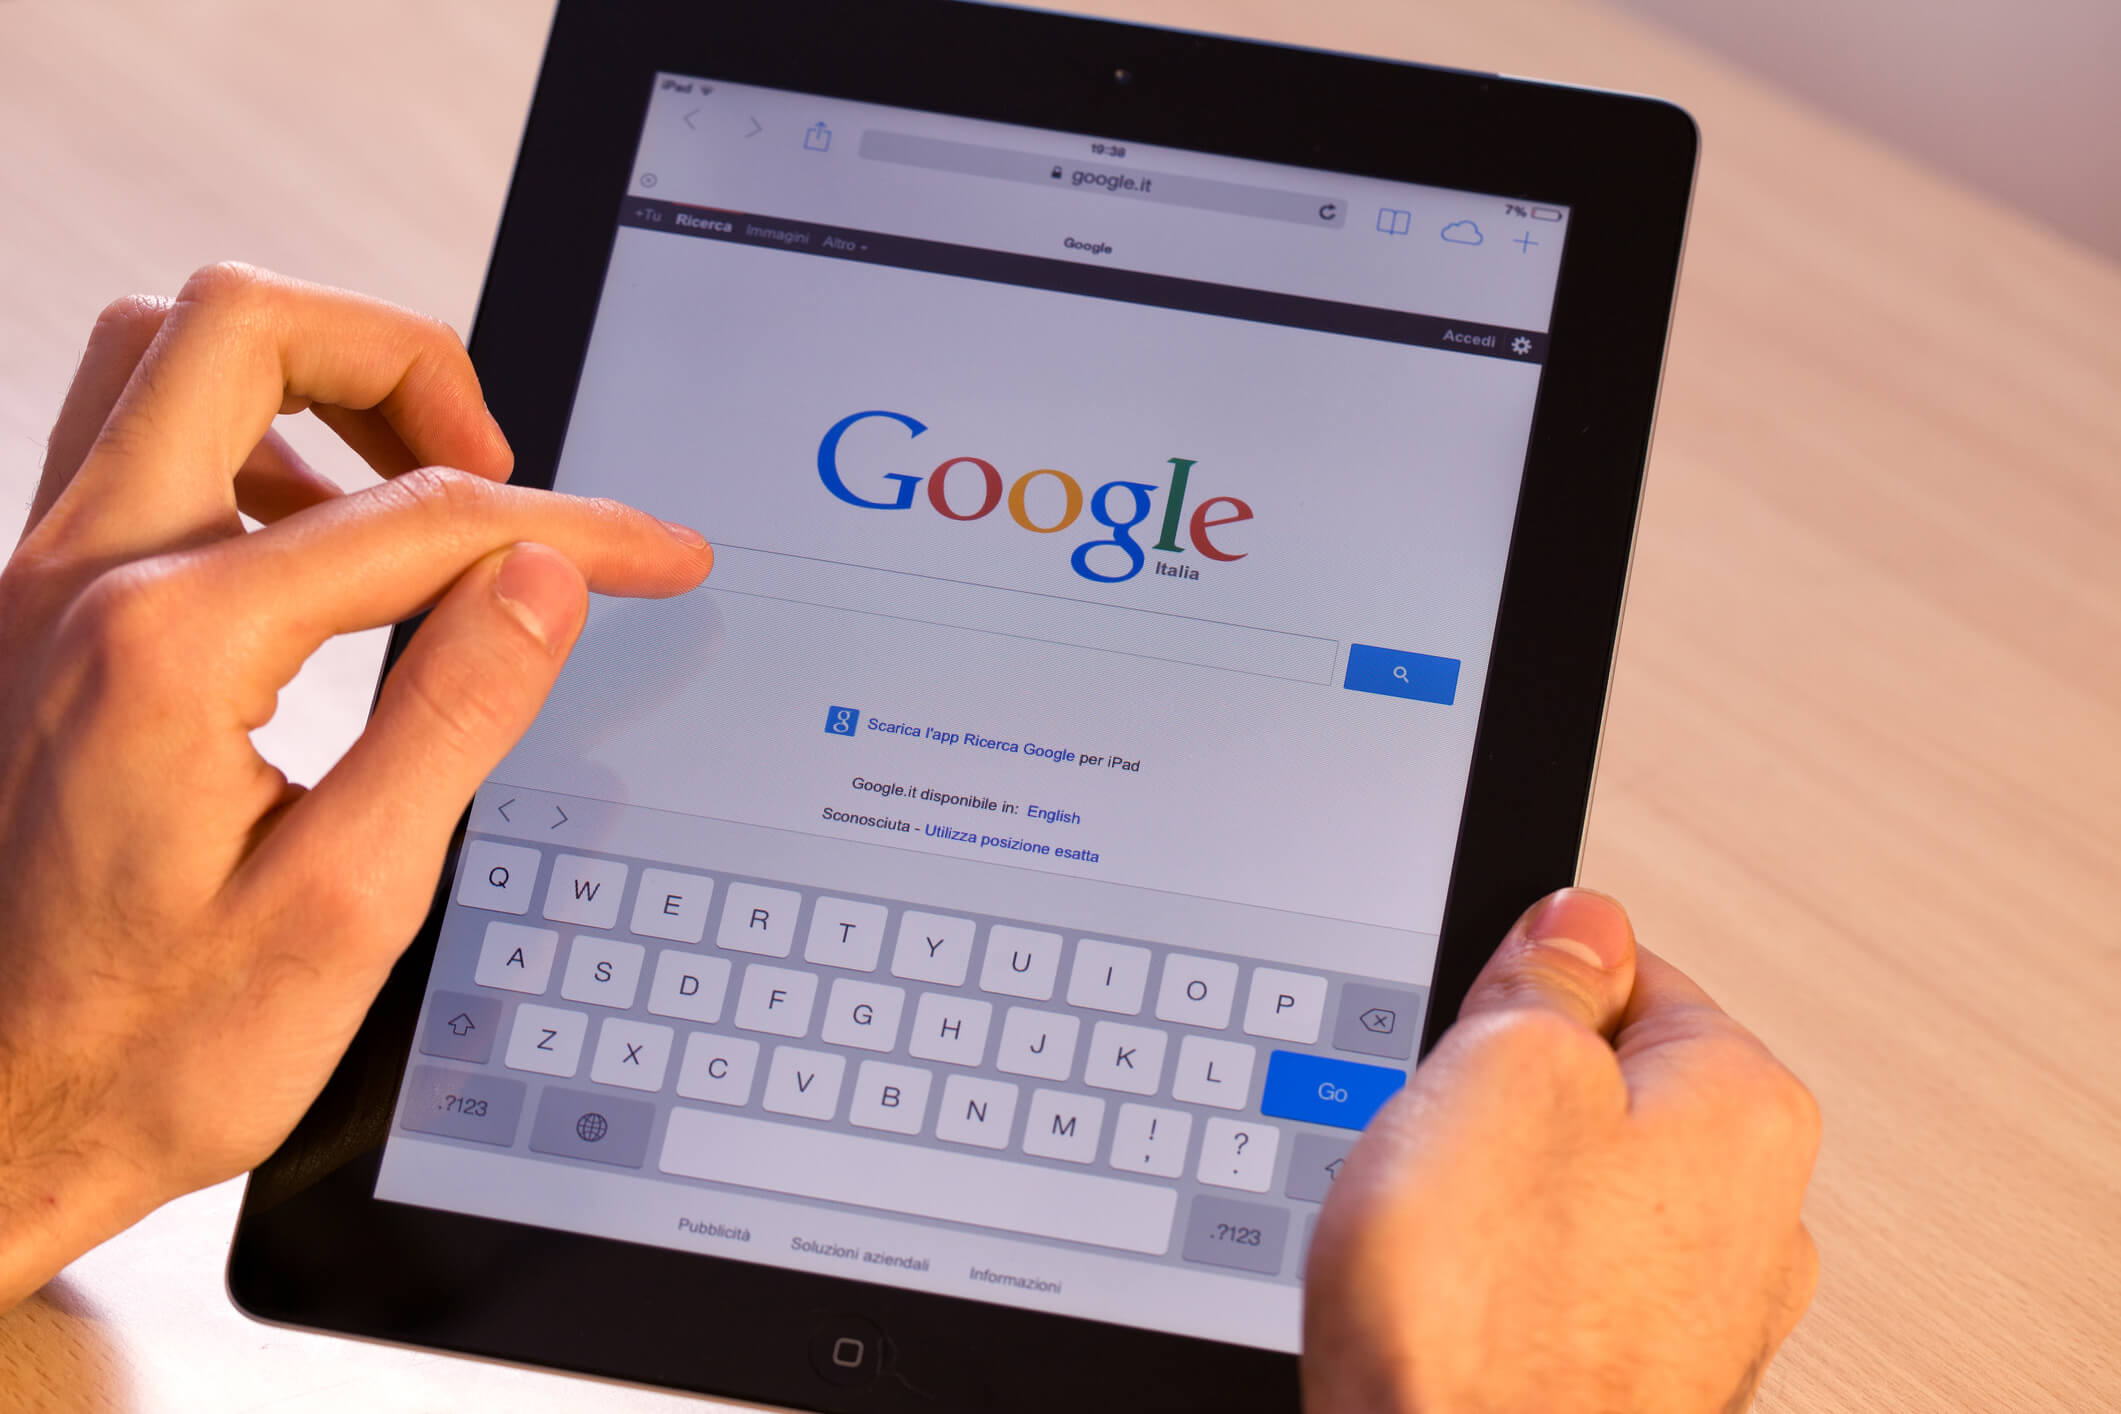 O que é LSI? Saiba como funciona a semântica do Google